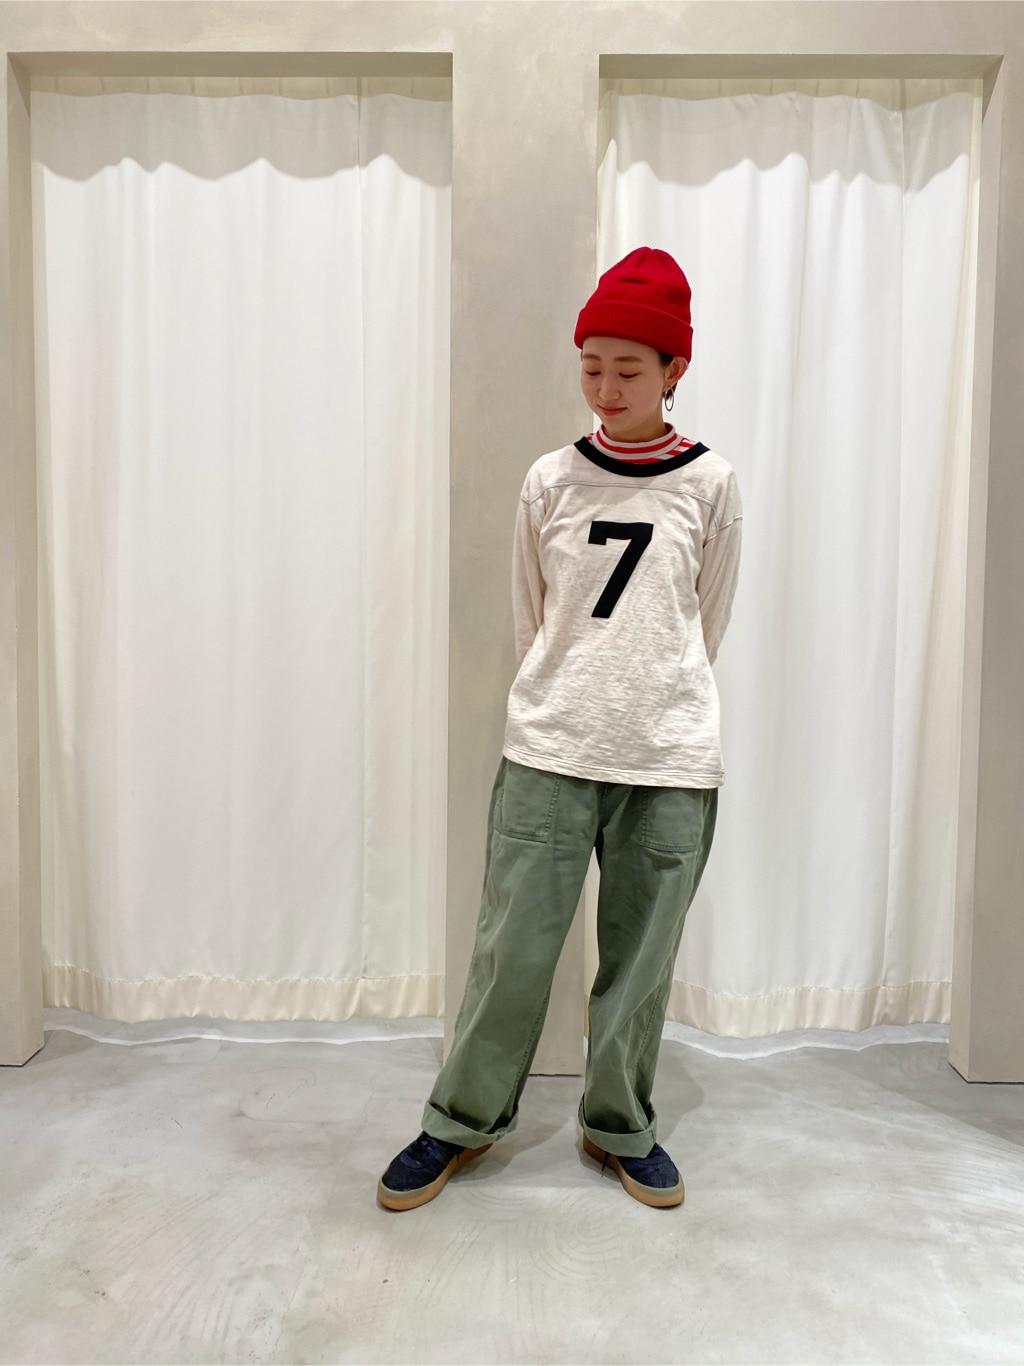 - CHILD WOMAN CHILD WOMAN , PAR ICI 東京スカイツリータウン・ソラマチ 身長:150cm 2021.01.04